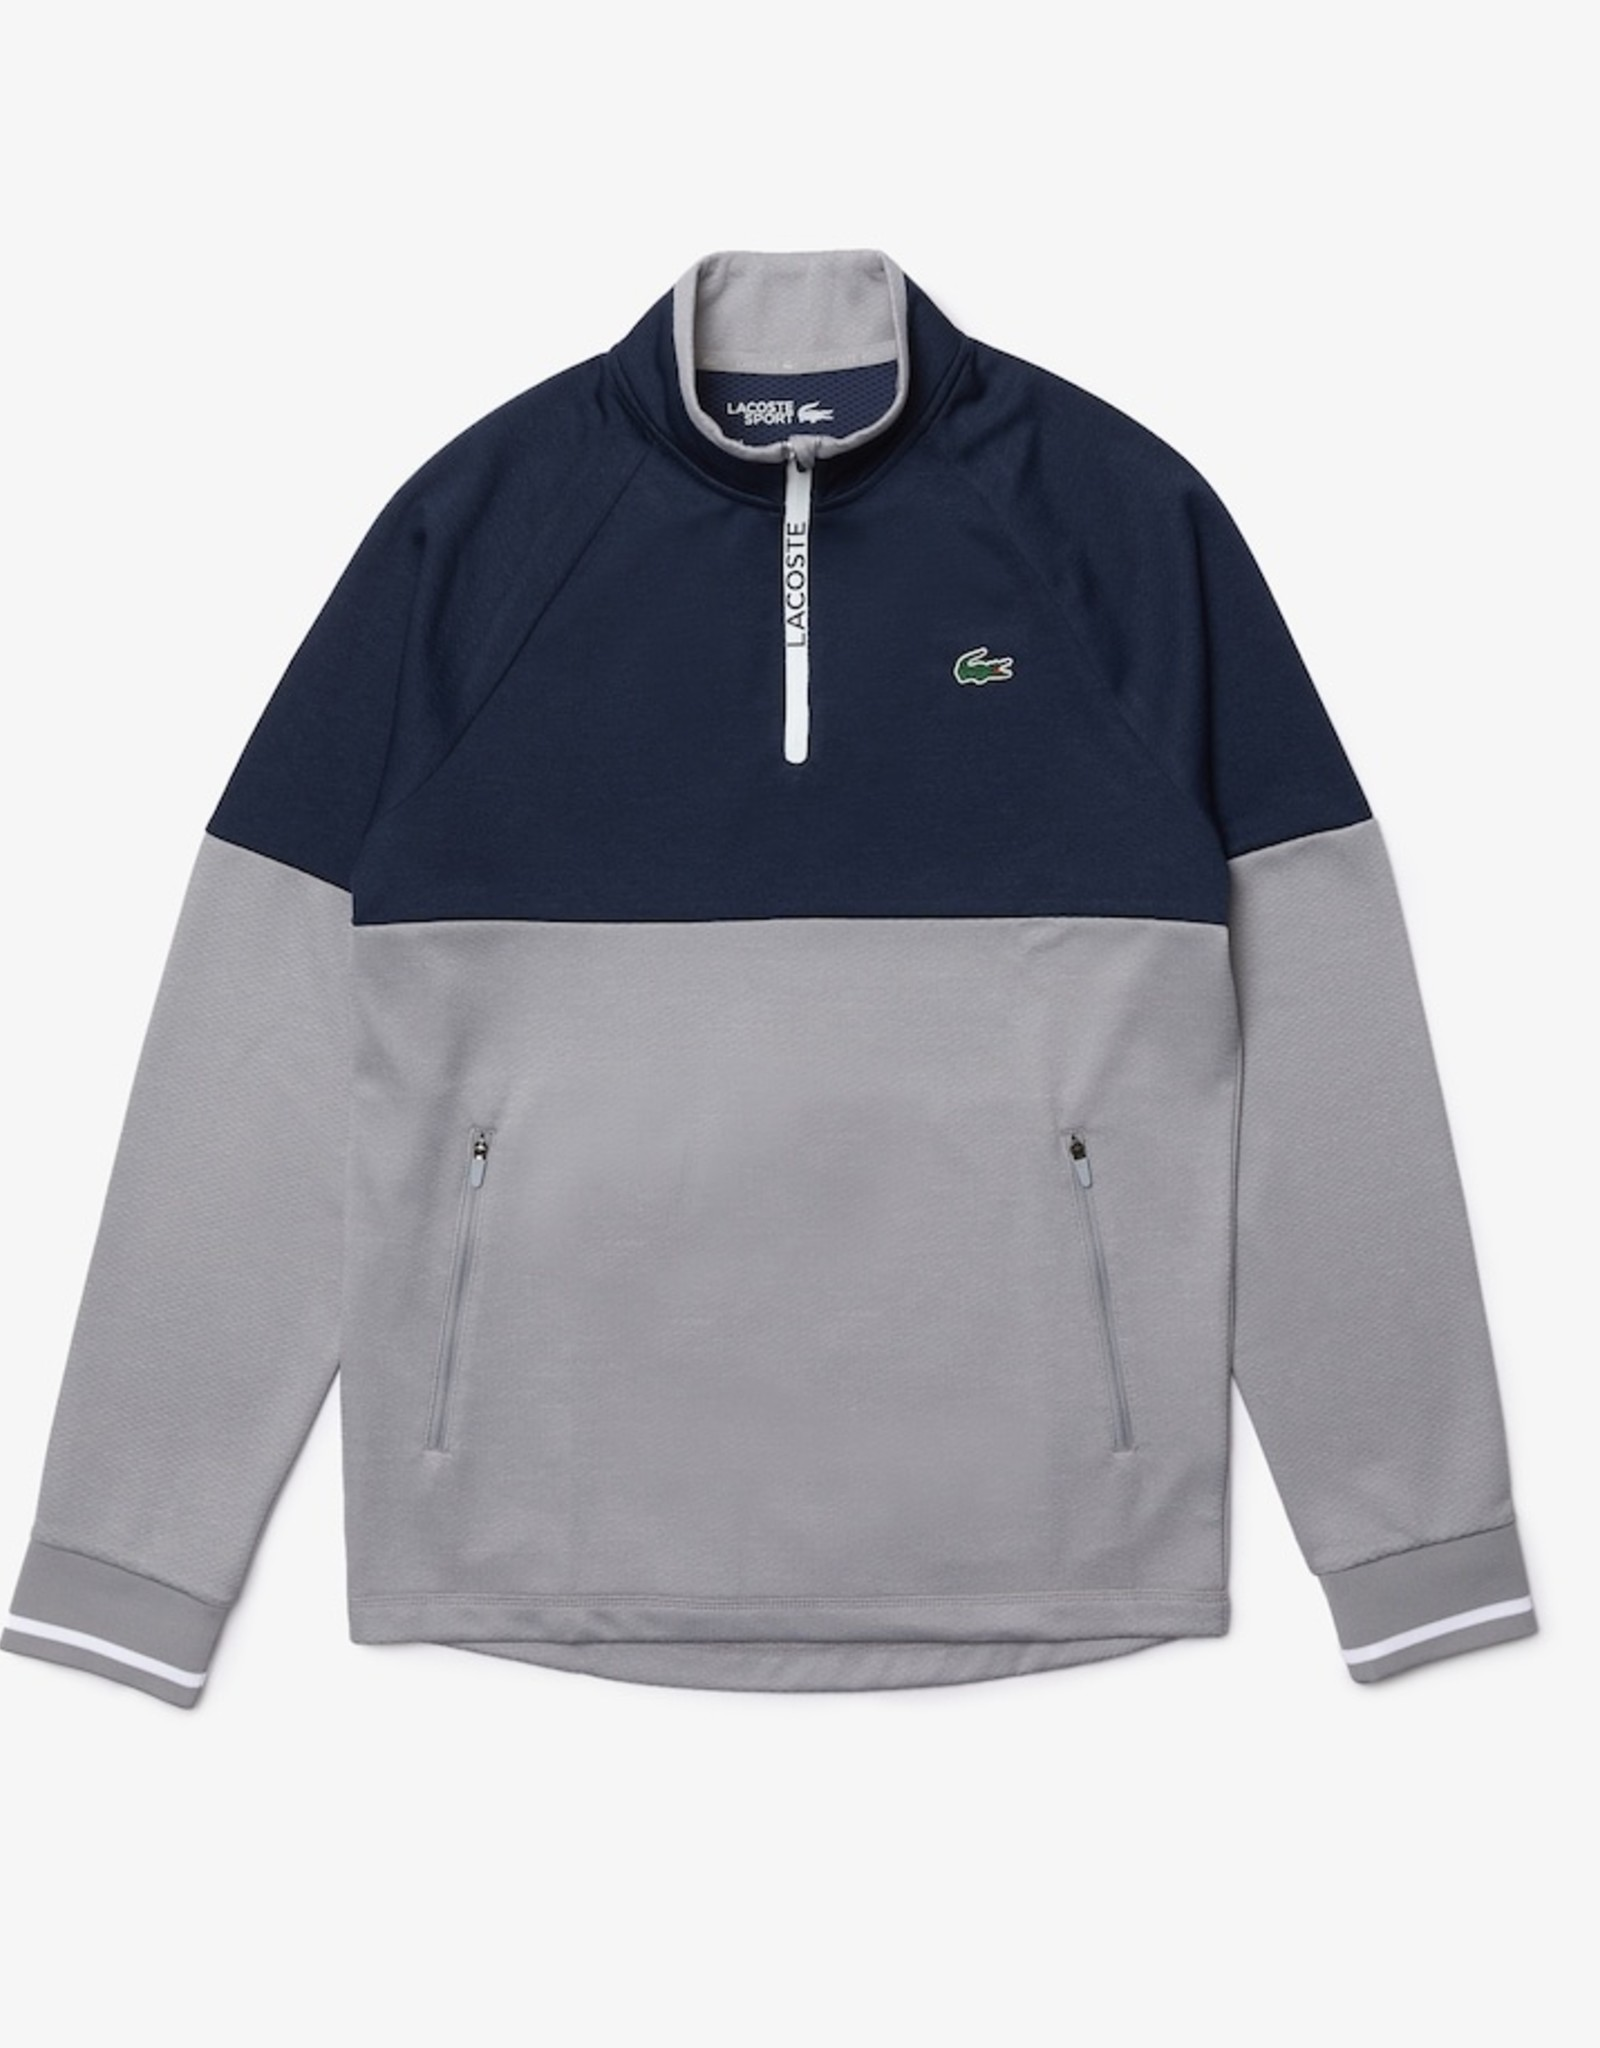 Lacoste Lacoste SPORT Zip Golf Sweatshirt